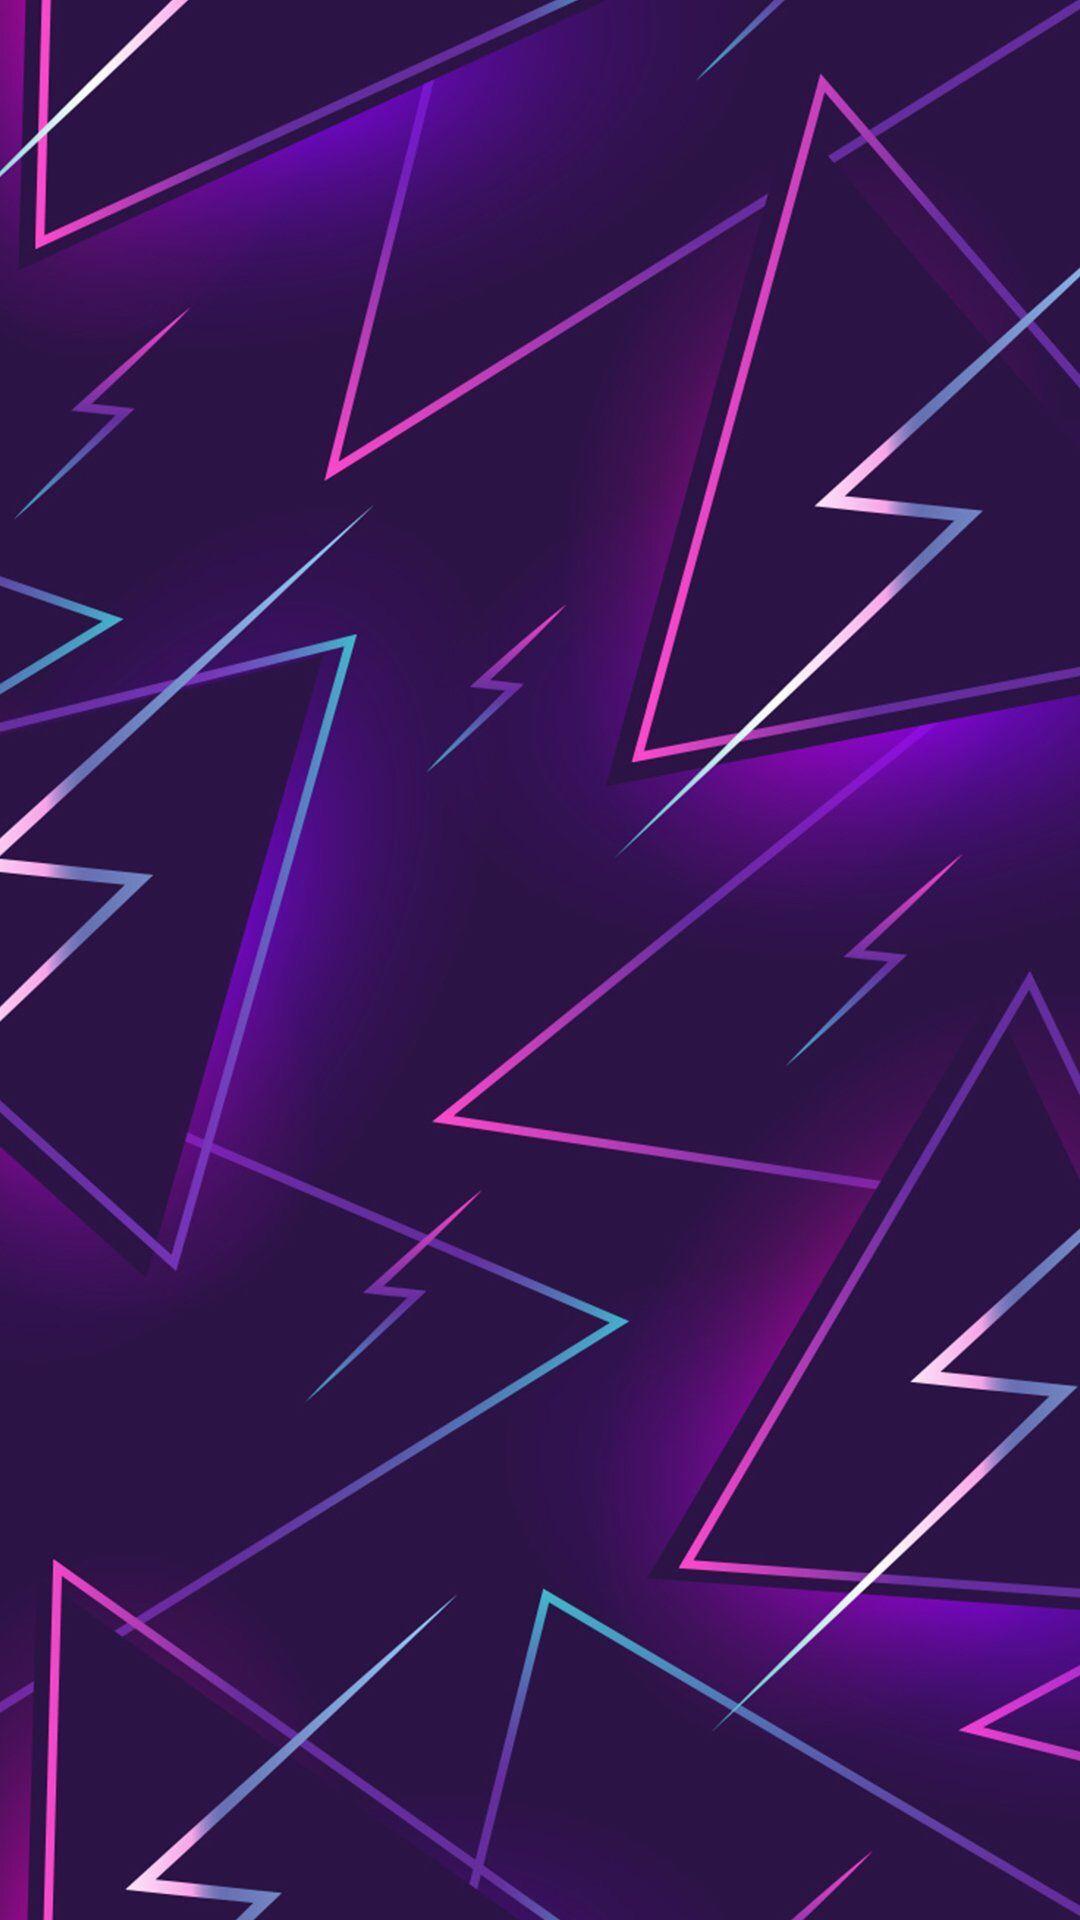 80s Purple Lightning In 2019 Purple Wallpaper Phone Neon